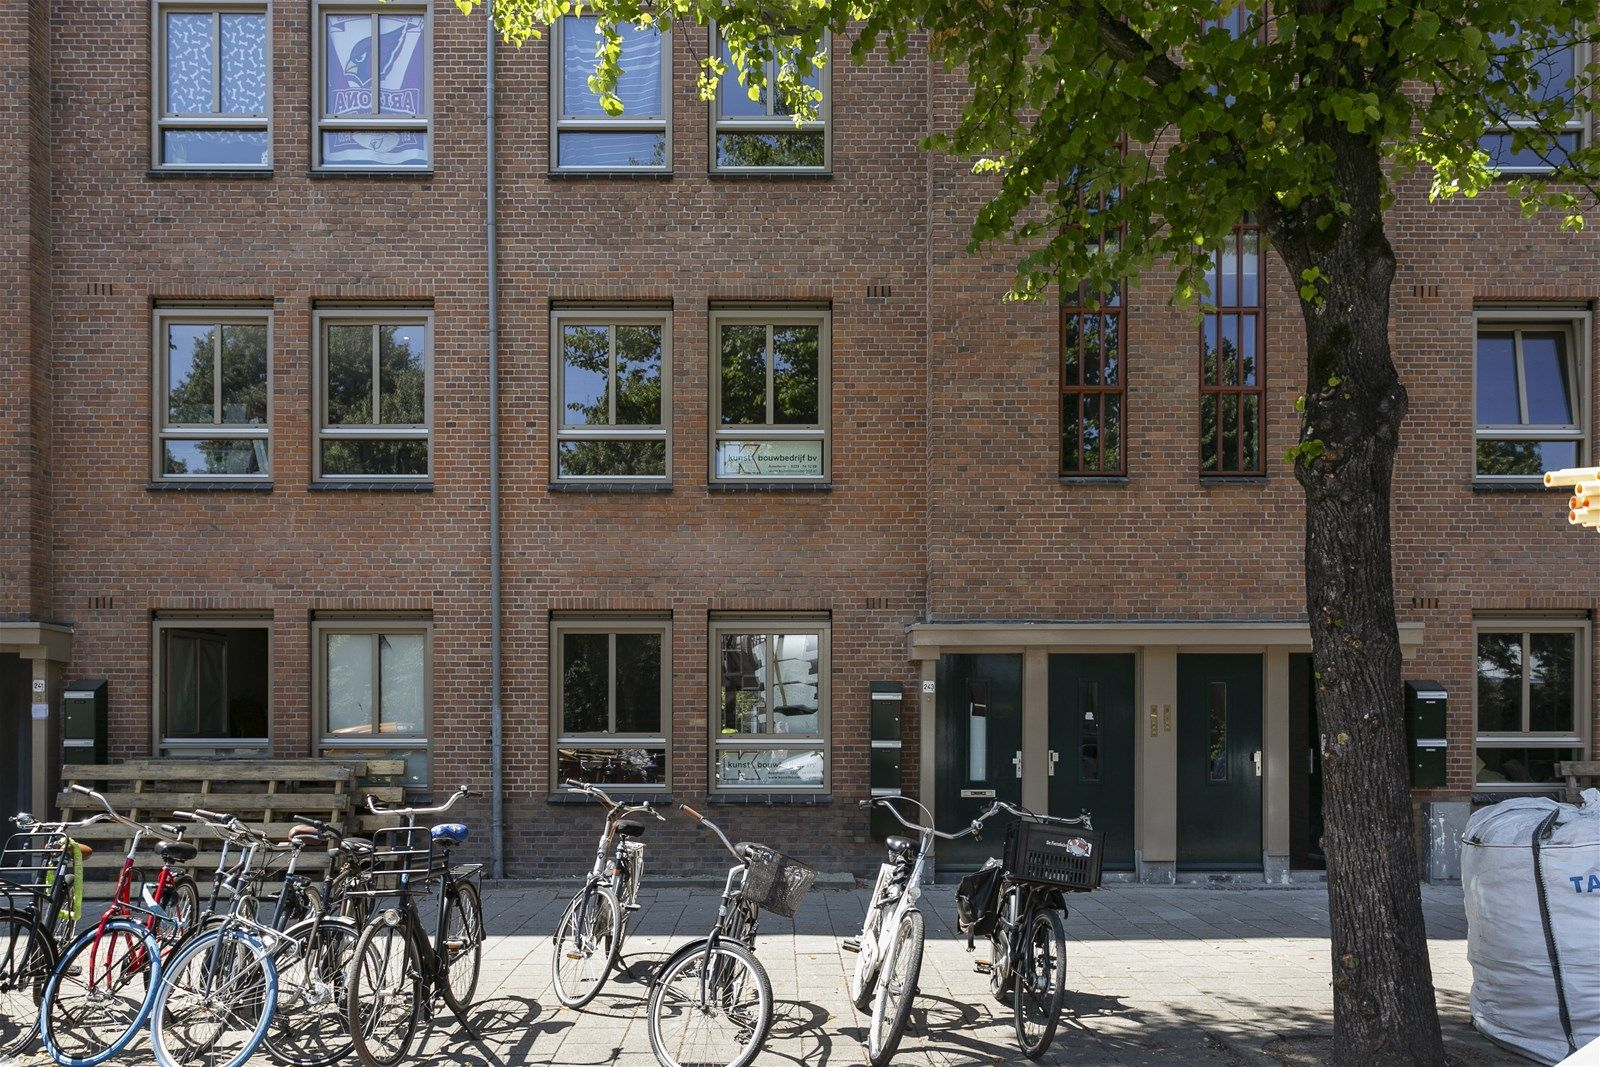 Willem de Zwijgerlaan 243a, Amsterdam